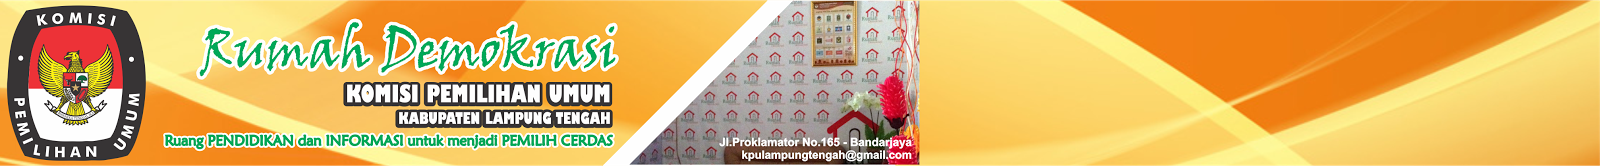 Rumah Demokrasi KPU Lampung Tengah